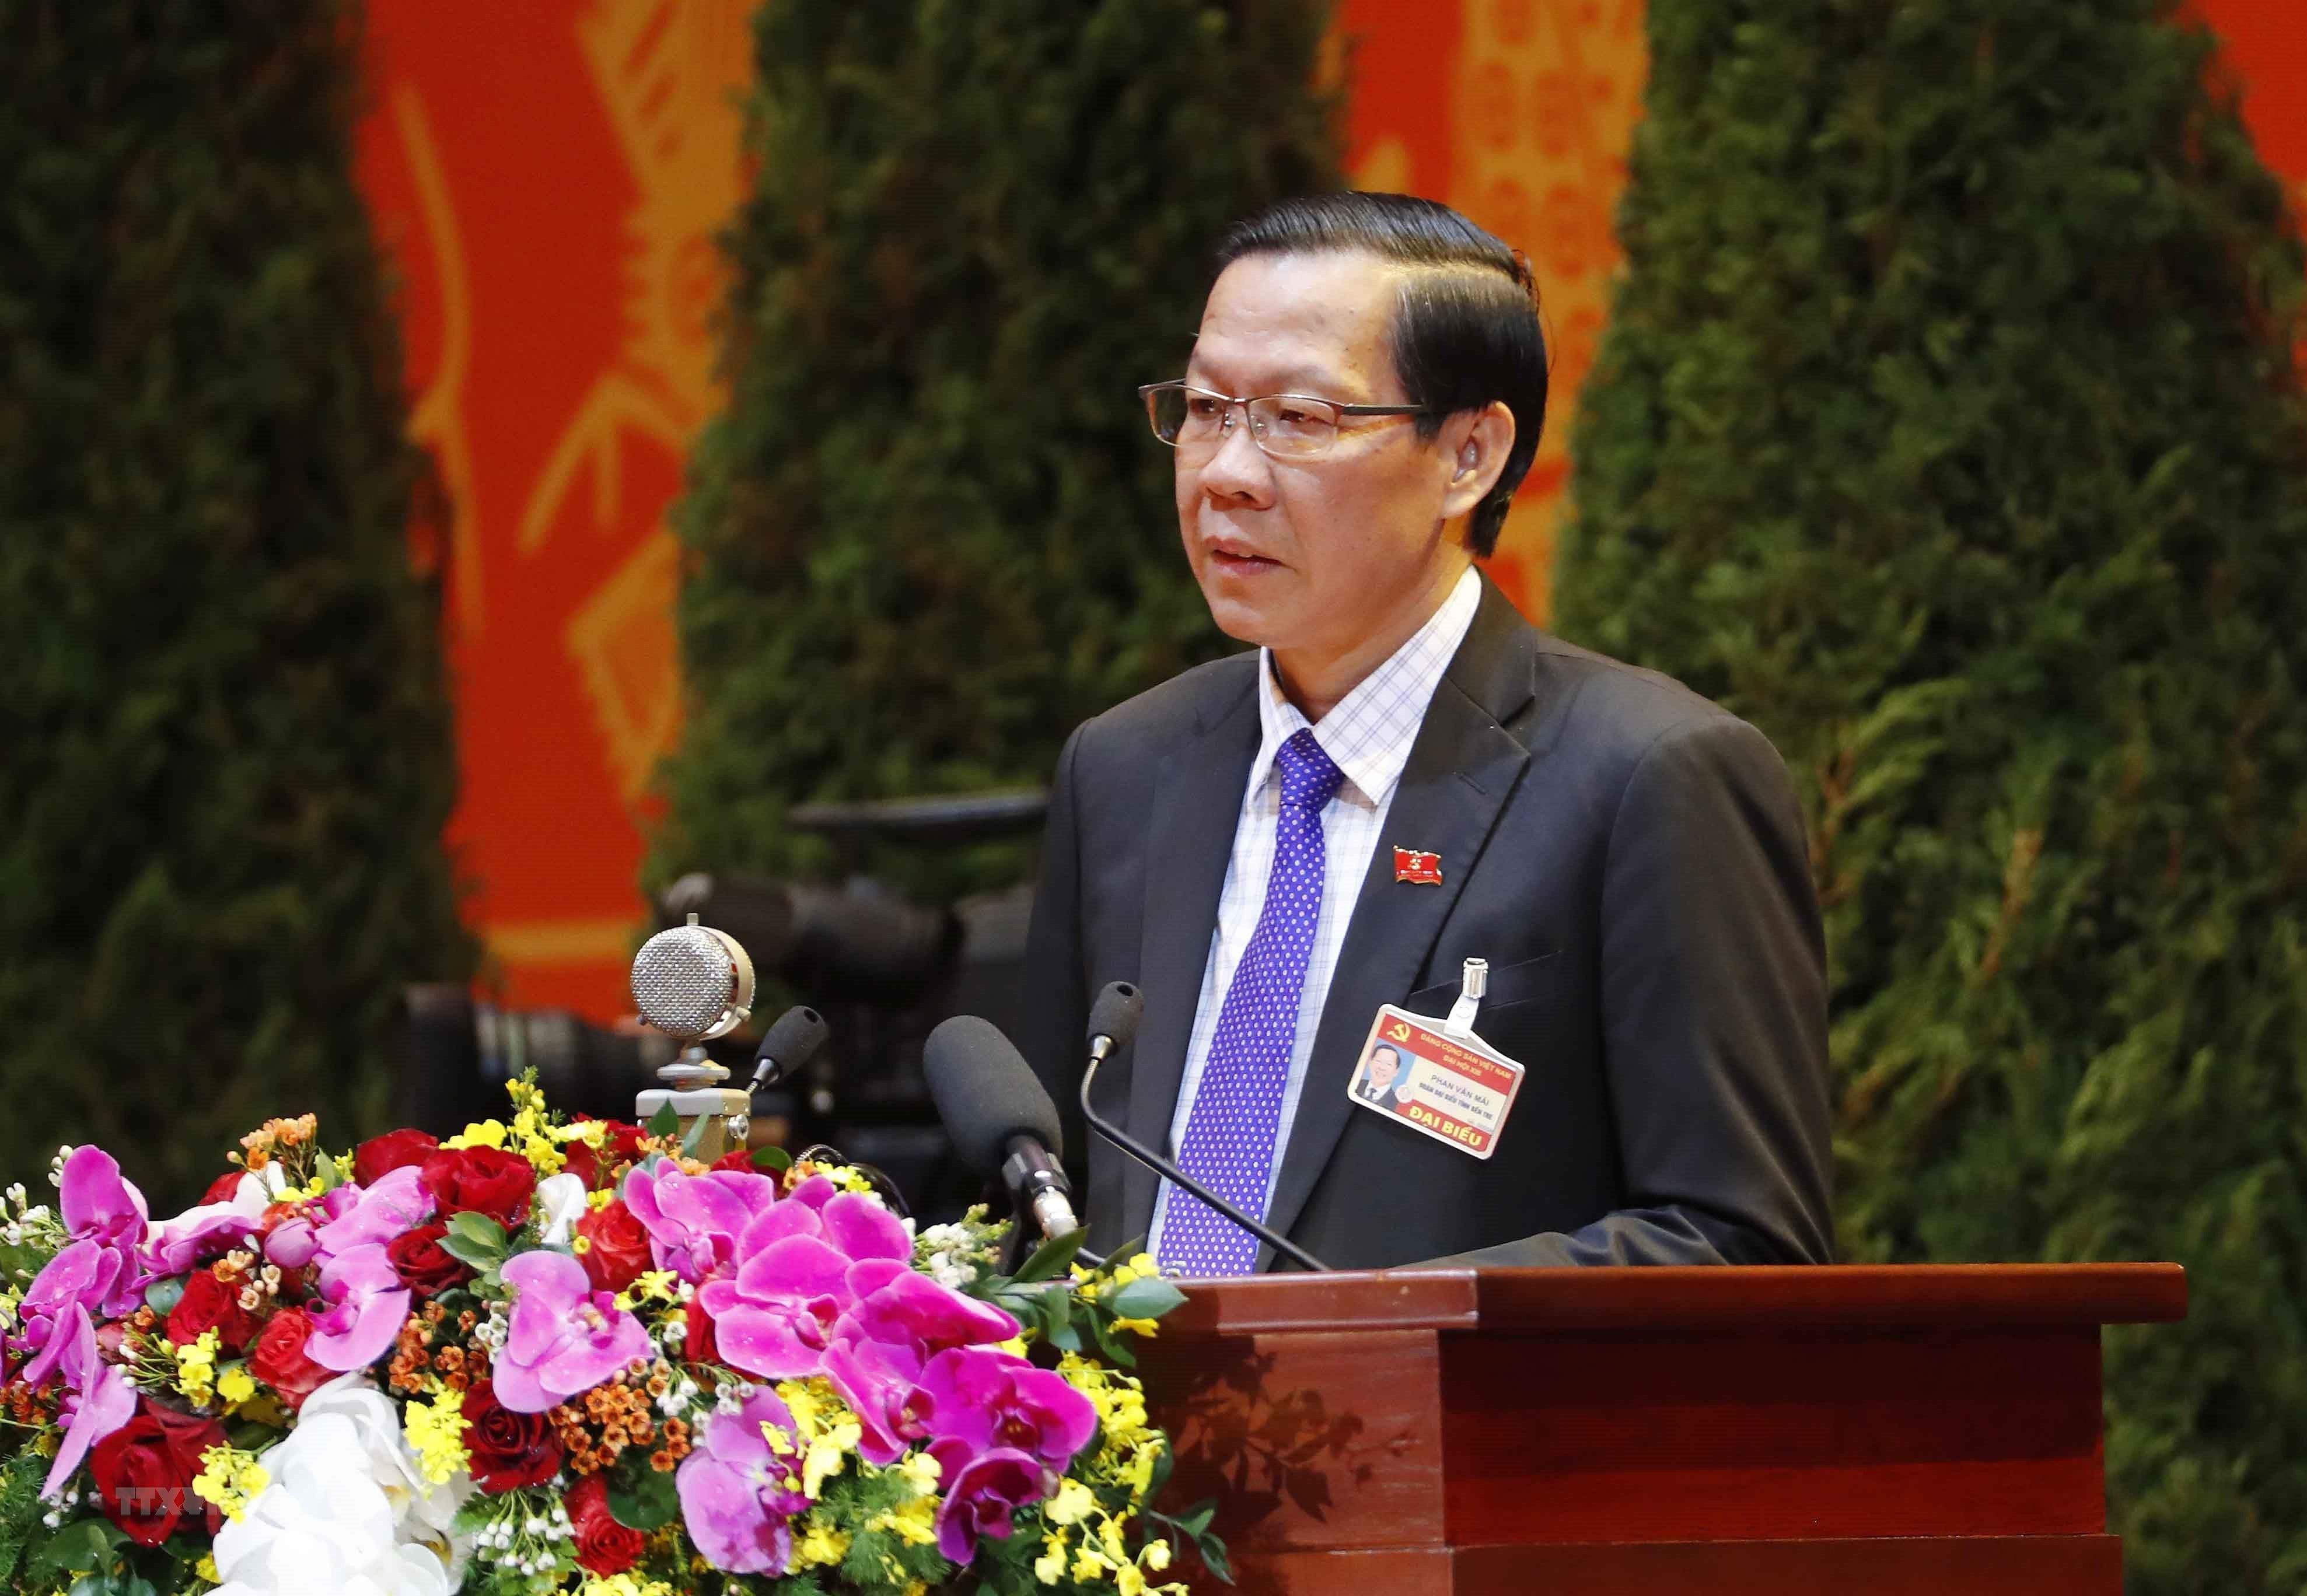 [Photo] Quang canh phien thao luan cac van kien Dai hoi XIII cua Dang hinh anh 29